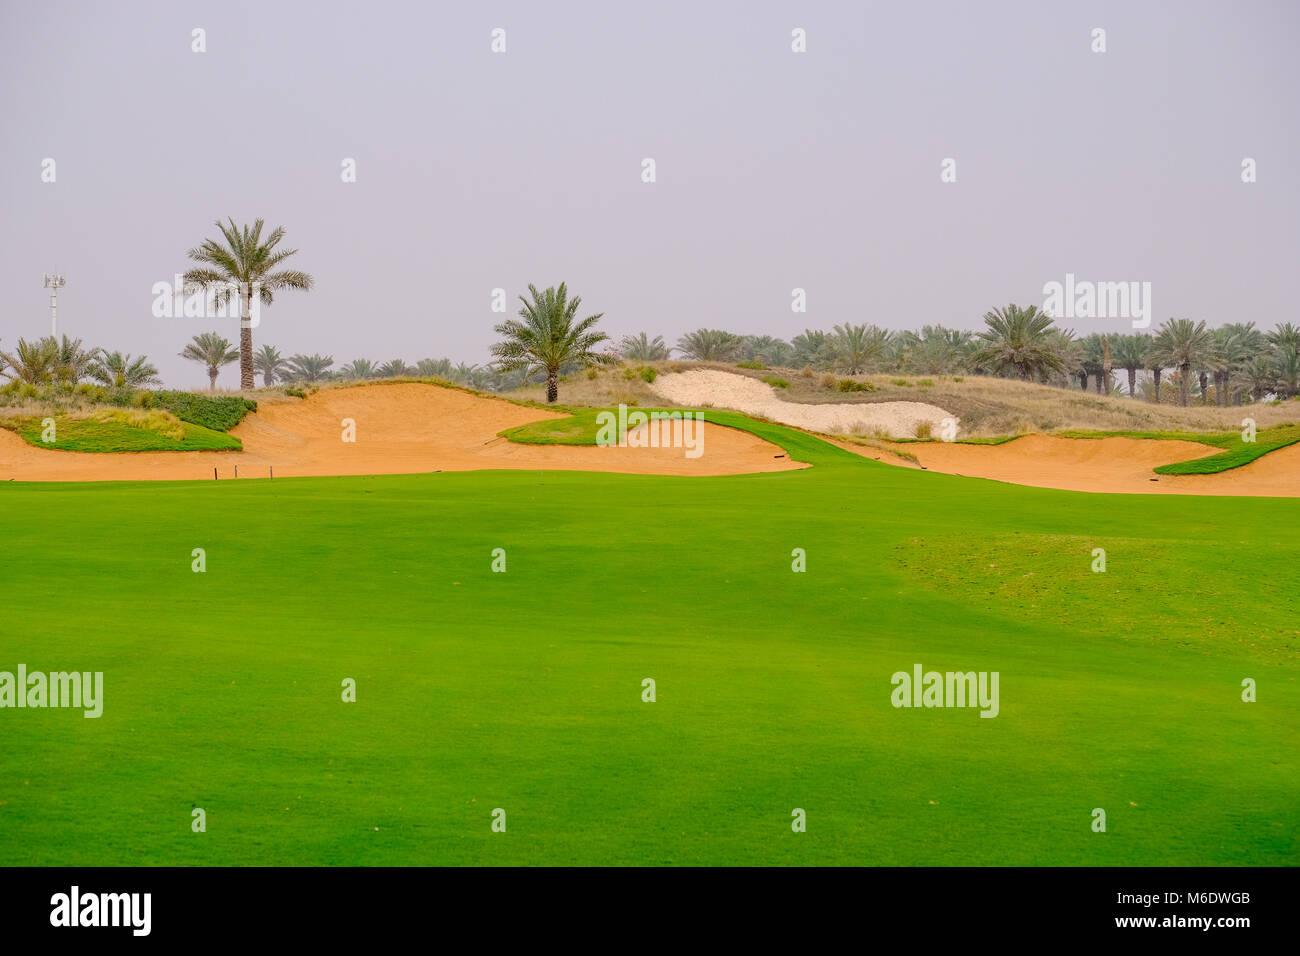 Saadiyat Beach Golf Course, 18 Hole, Par 4, Saadiyat Island Abu Dhabi Stock Photo